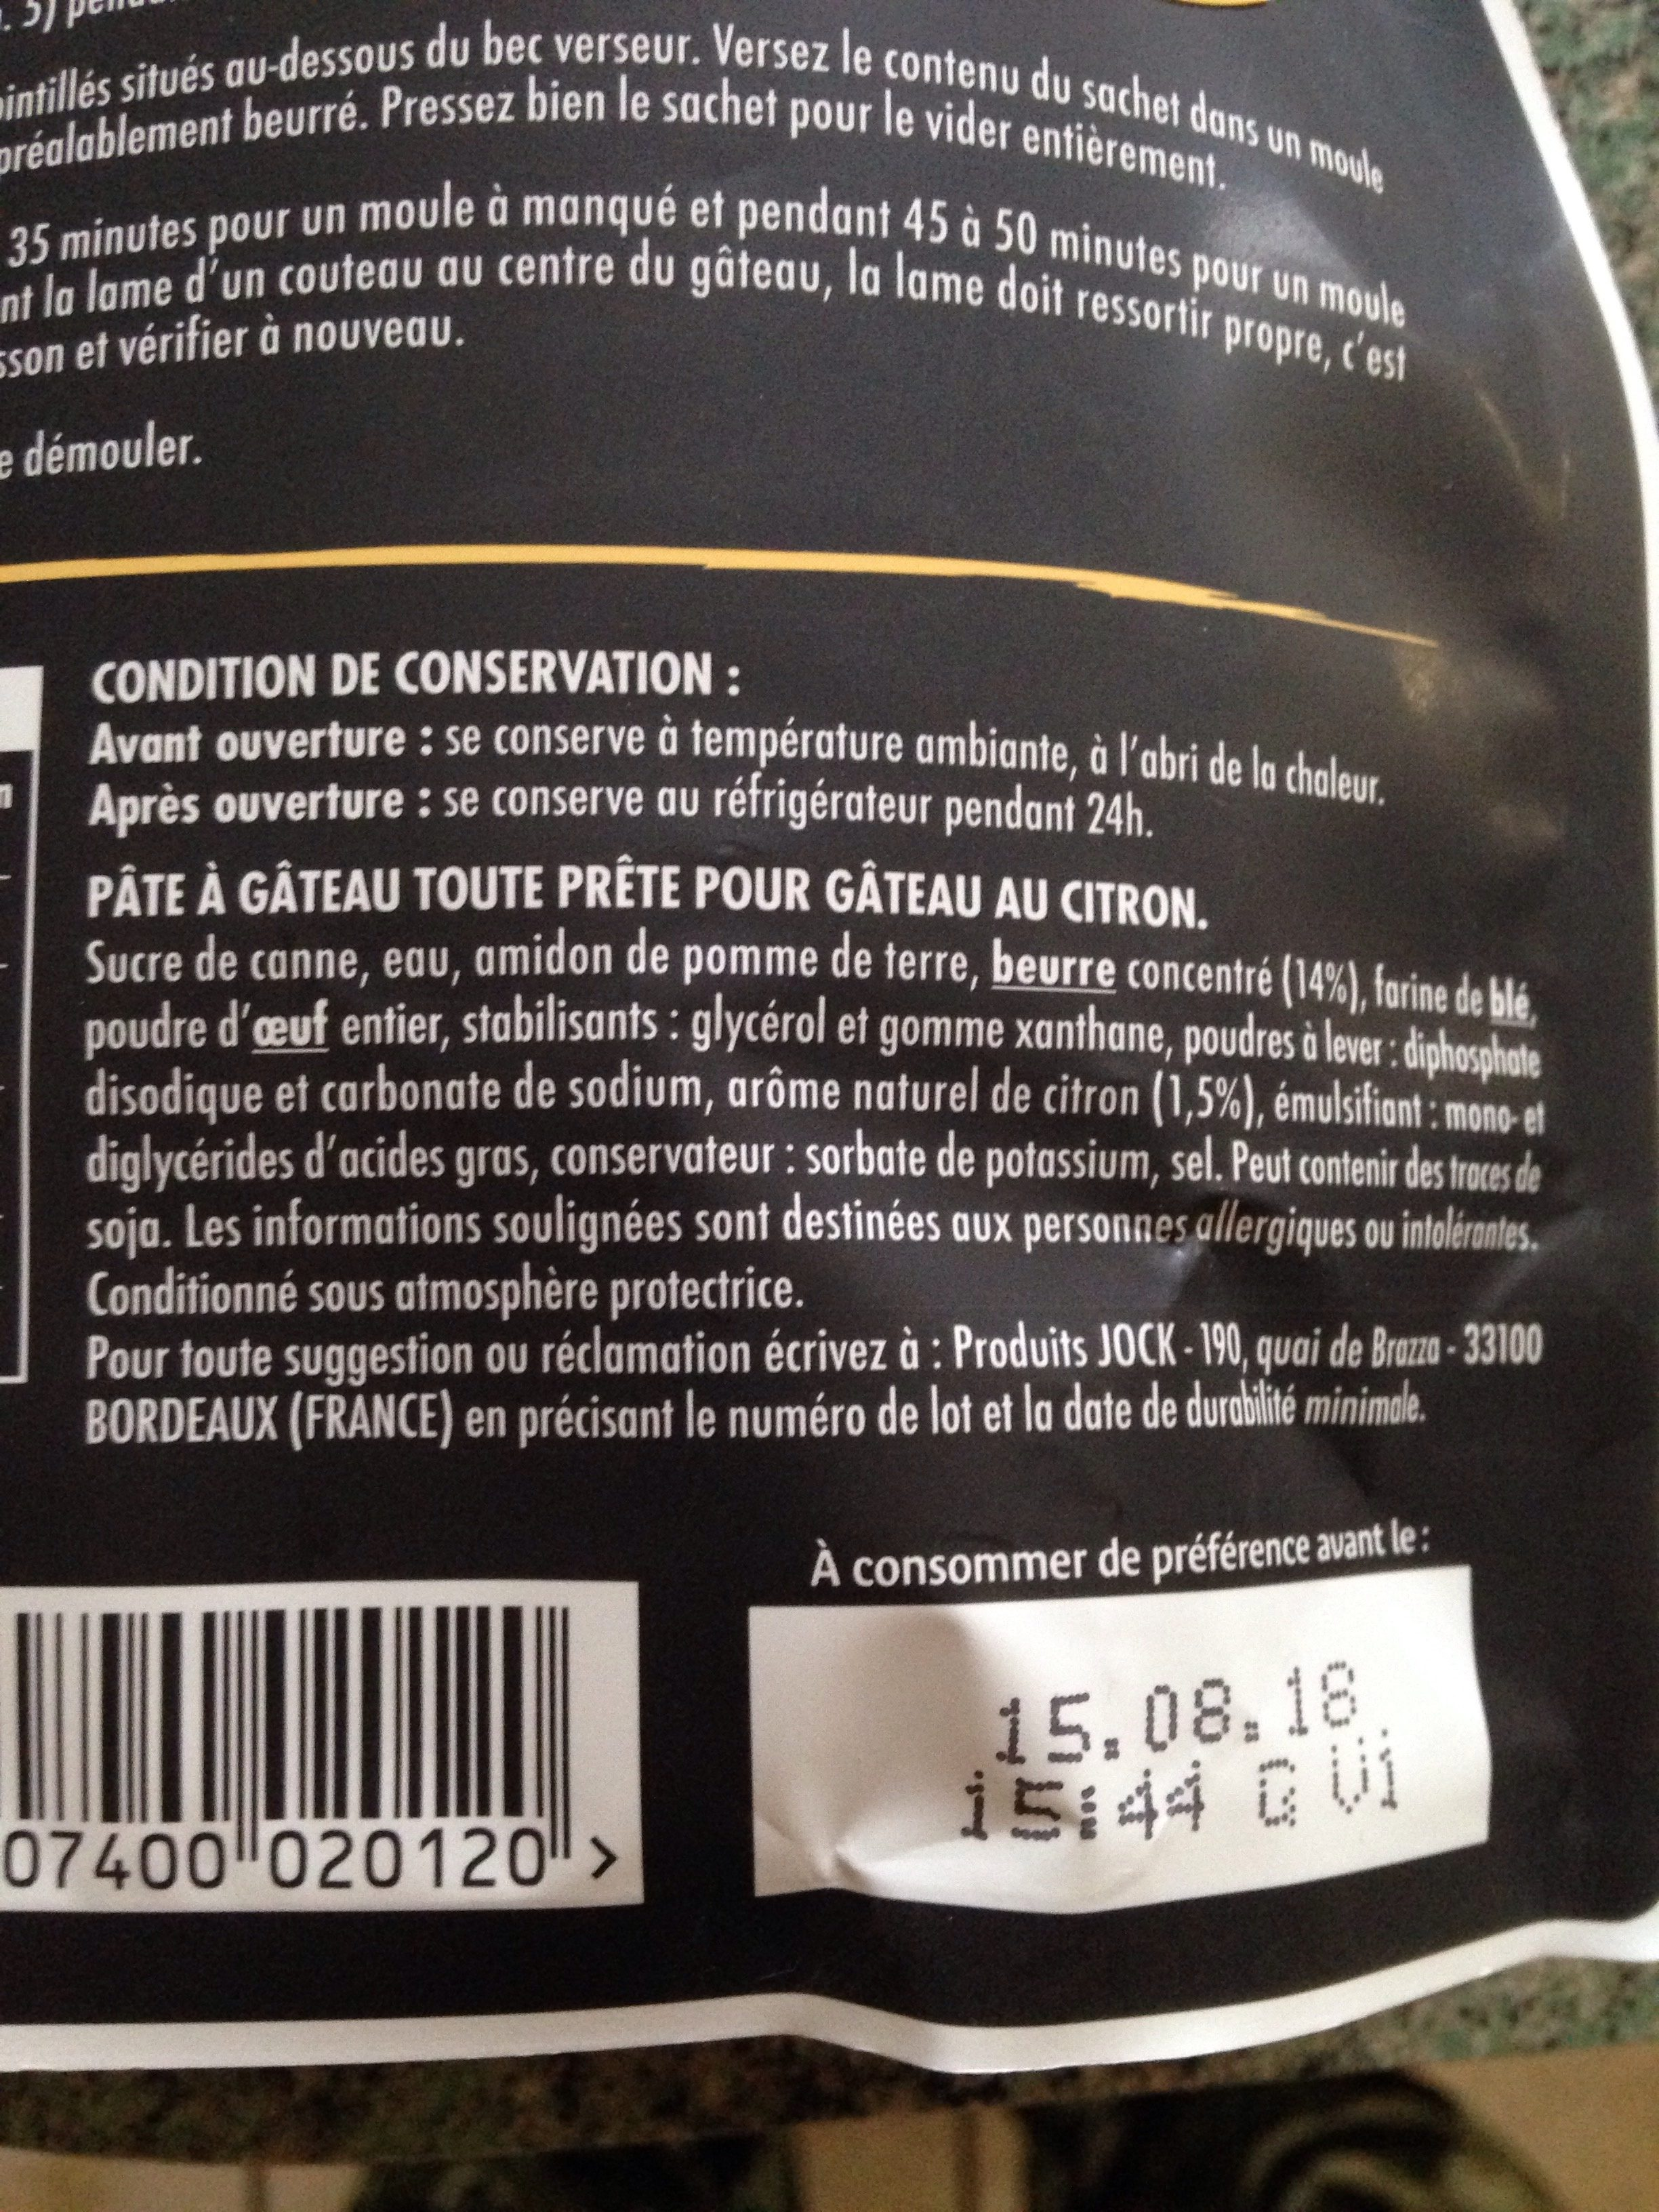 Gateau citron - Ingrediënten